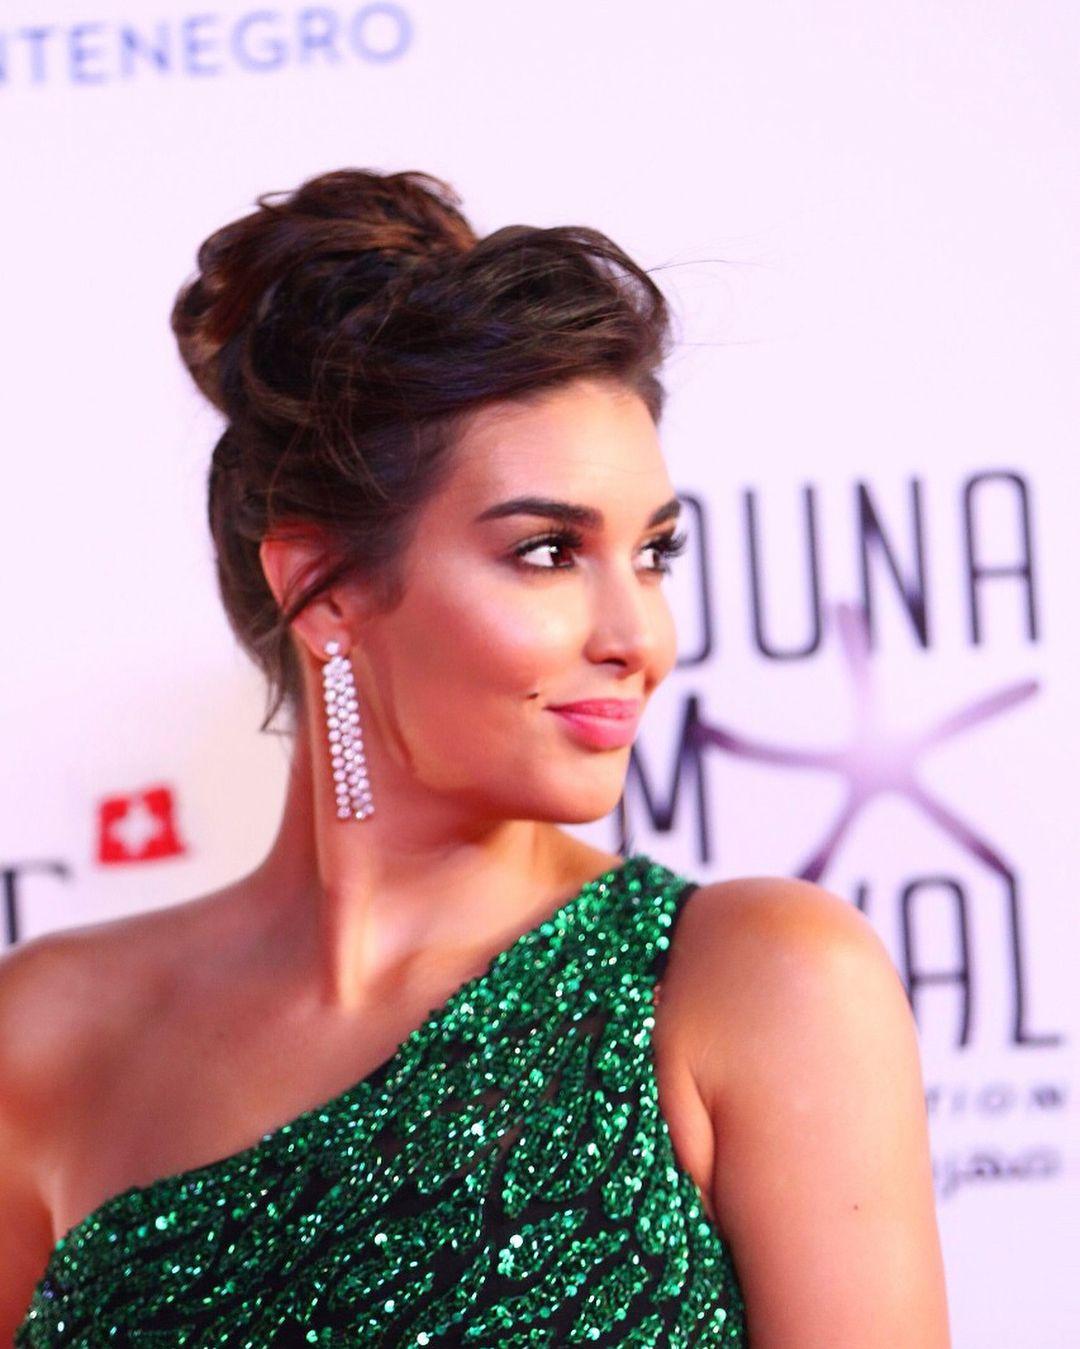 Yasmine Sabri ياسمين صبري Arab Celebrities Celebrities Social Media Beauty Full Girl